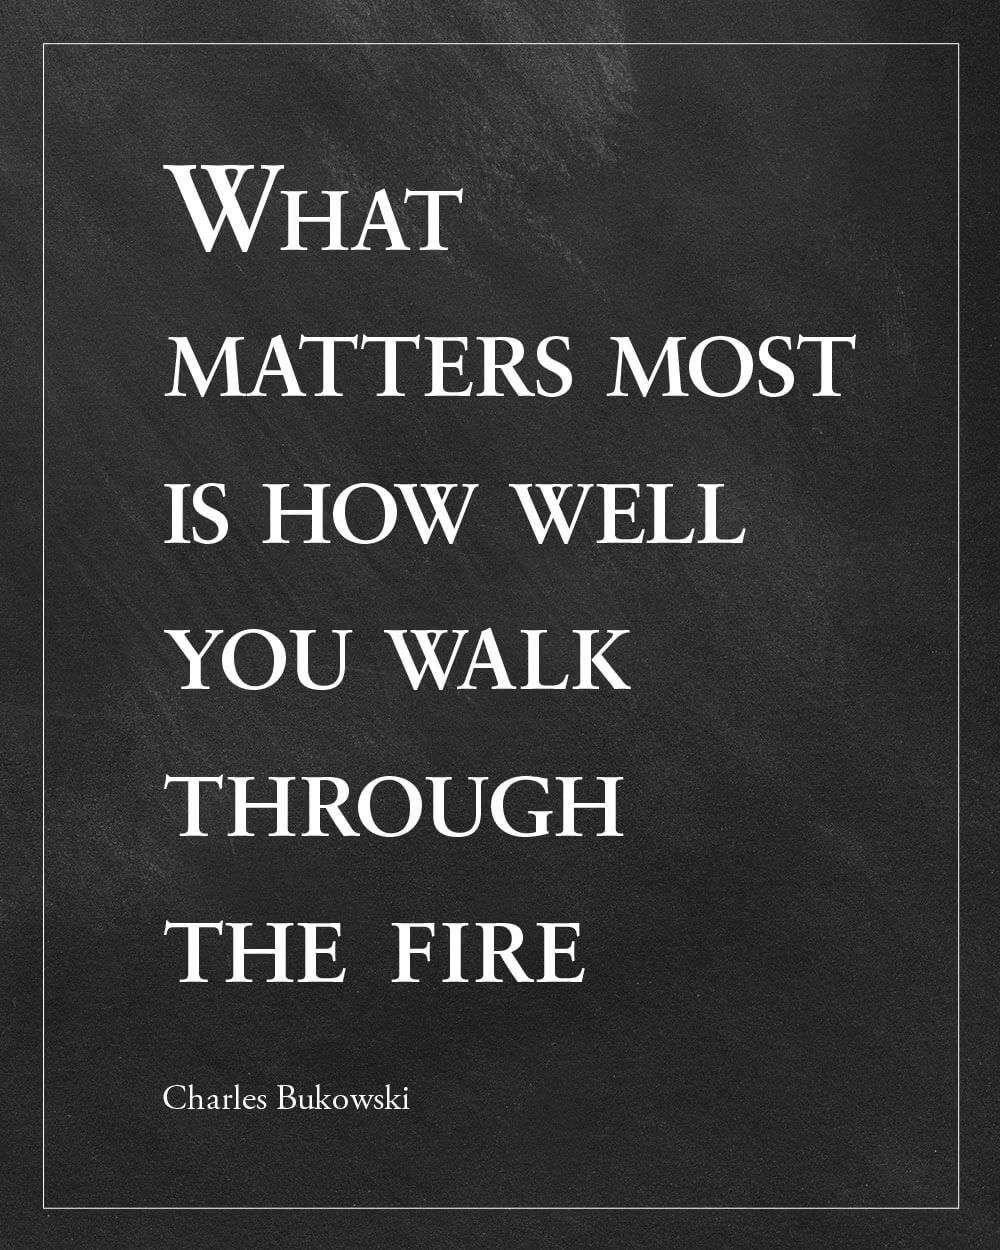 Bukowski Quote - Walk Through Fire